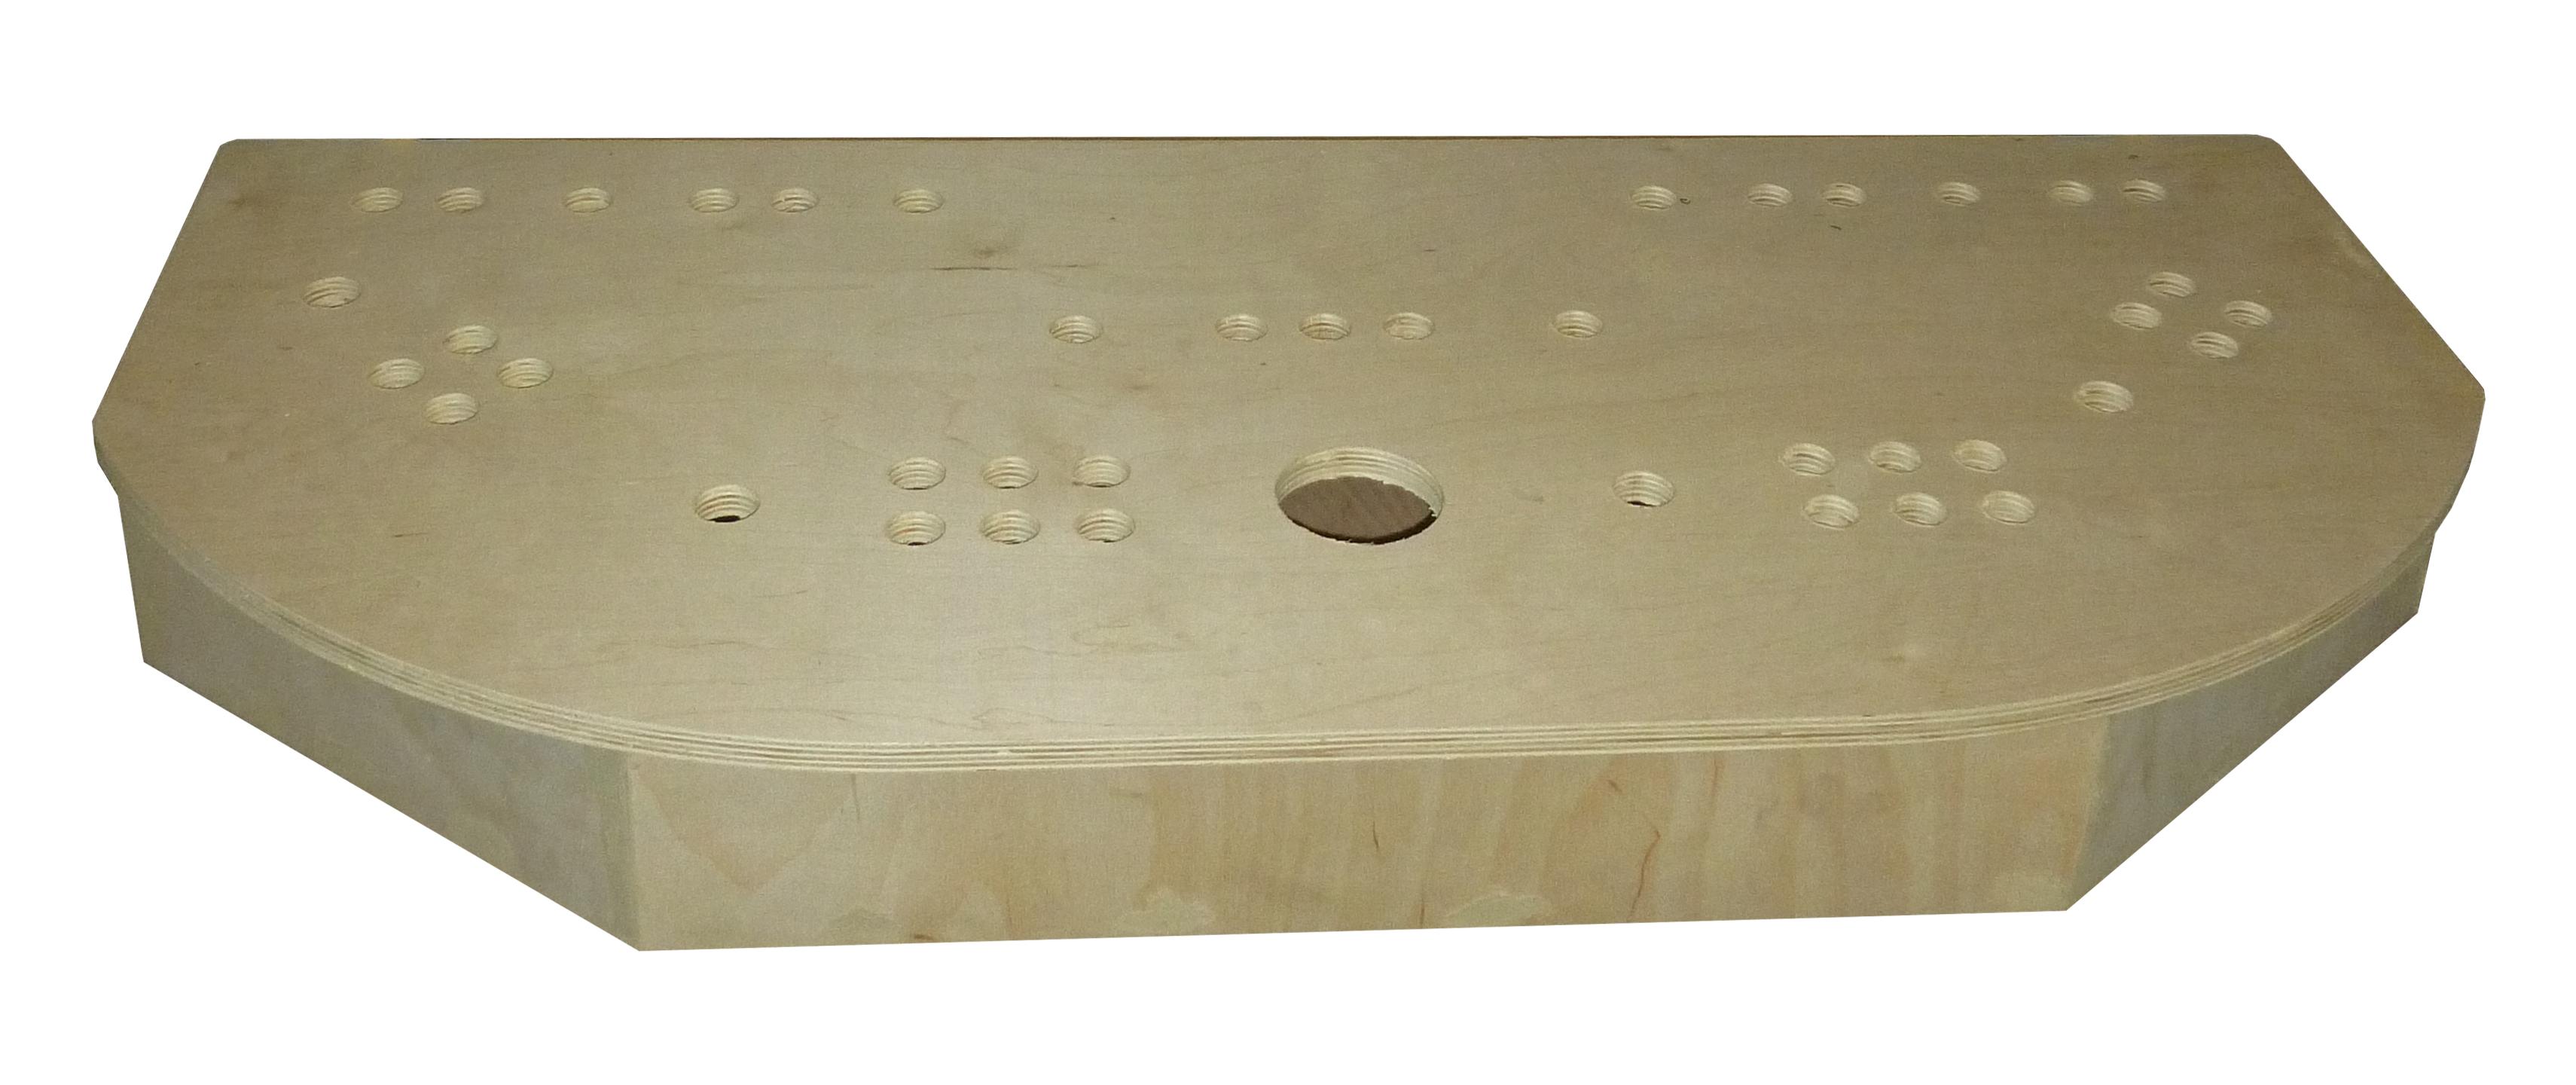 4 Player Arcade Cabinet Kit 4 Player Control Panel Kit Monster Arcades Custom Arcades